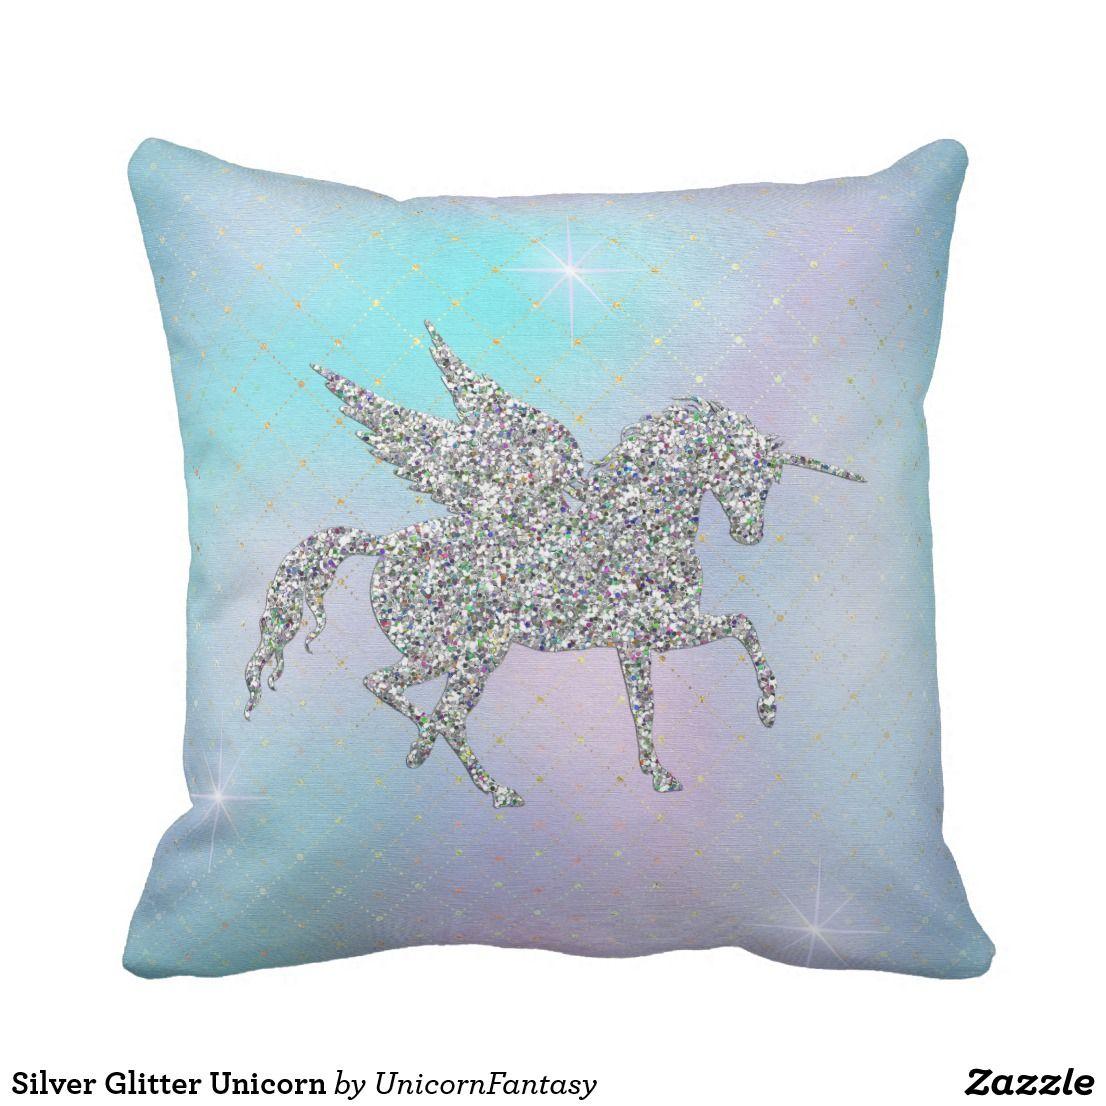 The Glittery World Of Silver Bedroom Ideas: Silver Glitter Unicorns On Pastel Throw Pillow